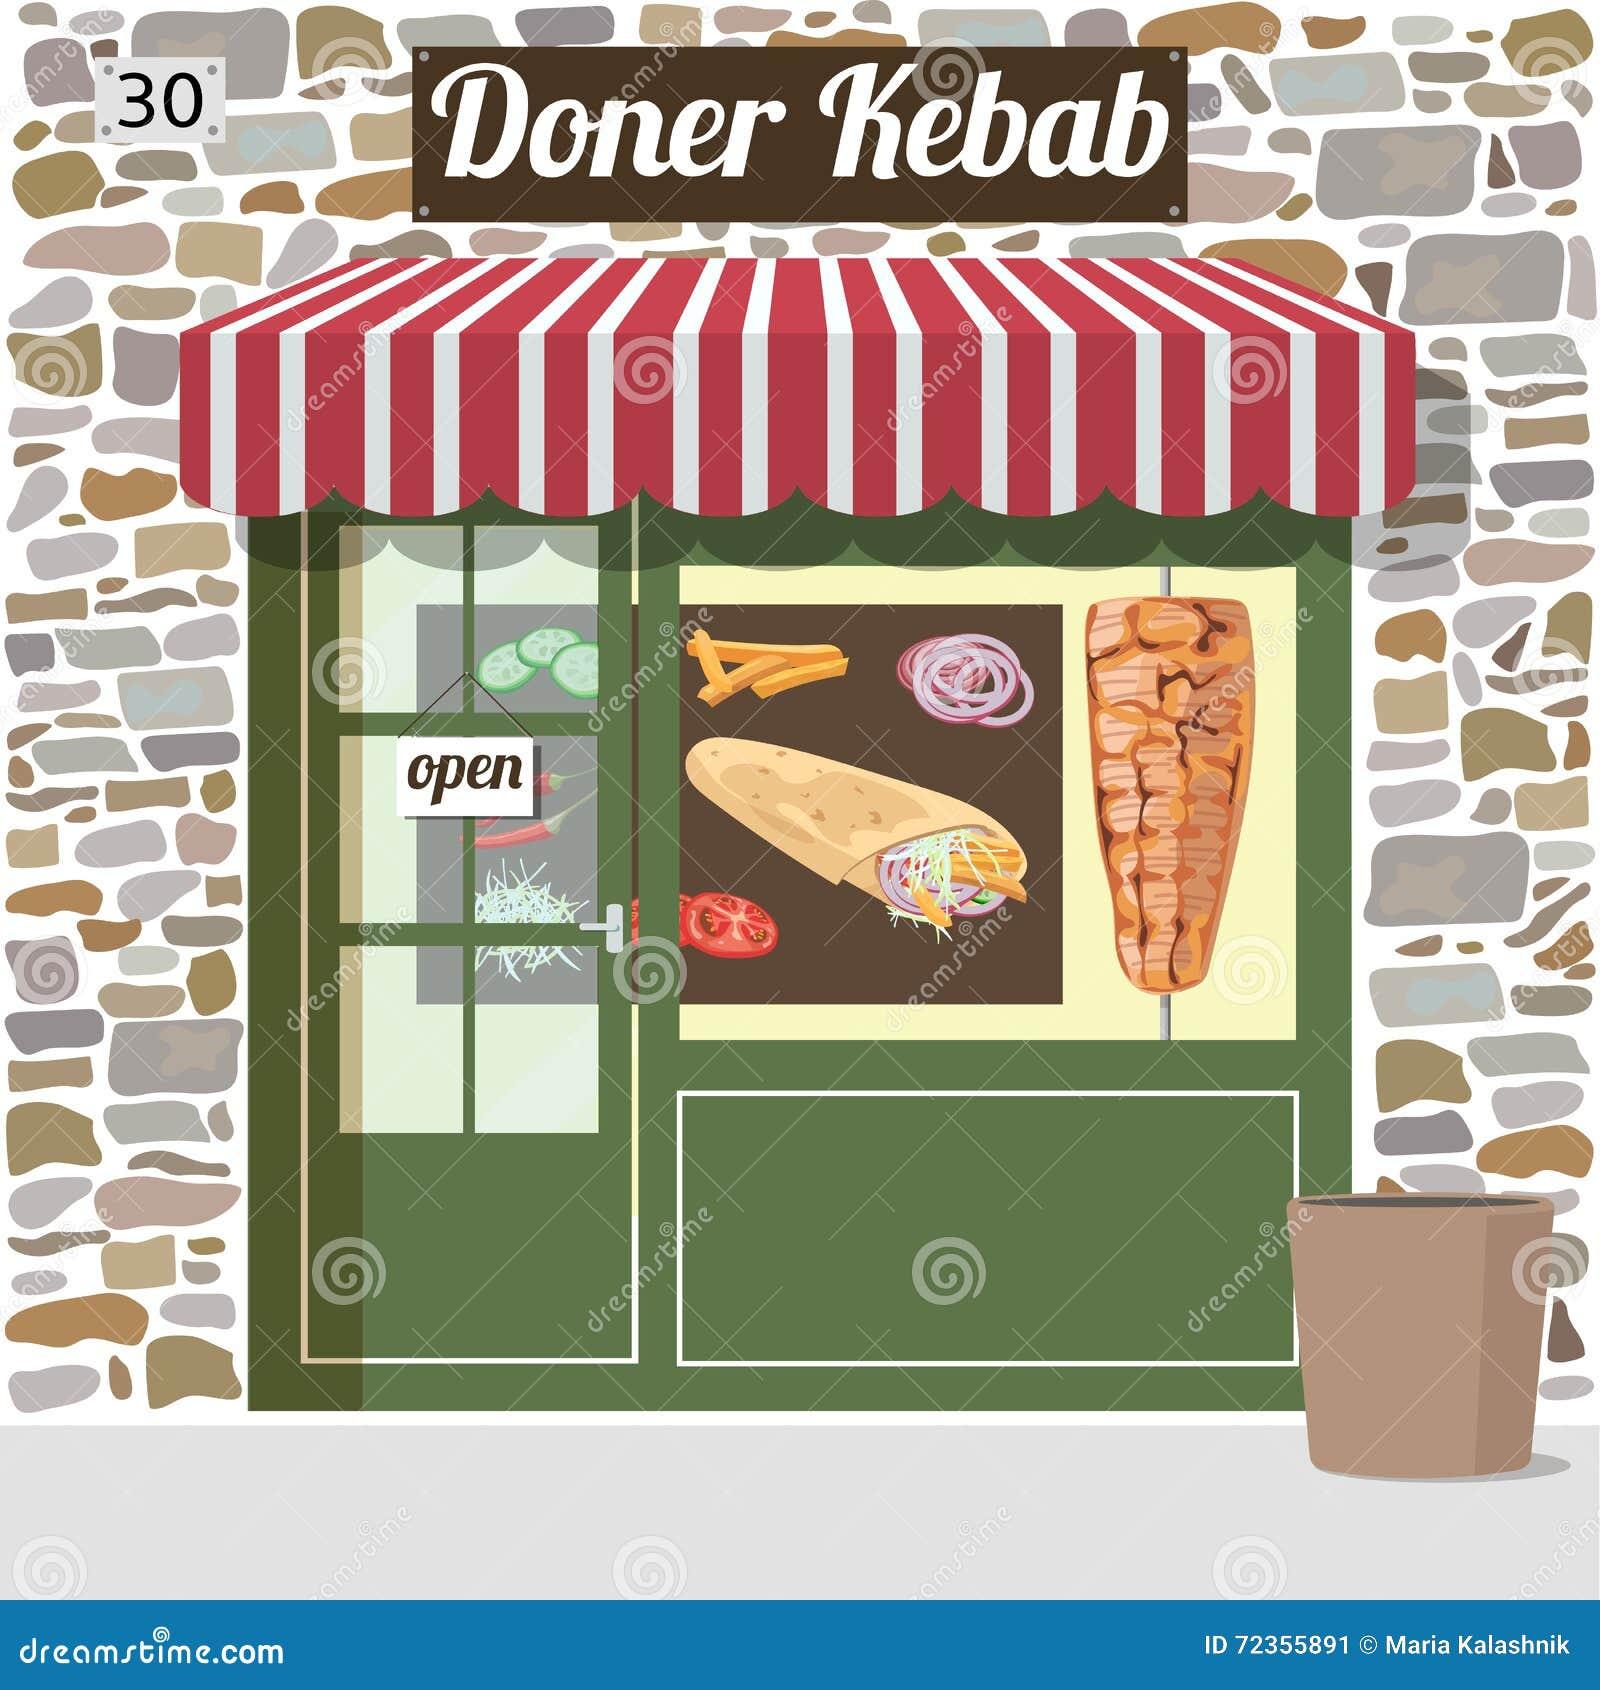 Doner kebab快餐咖啡馆